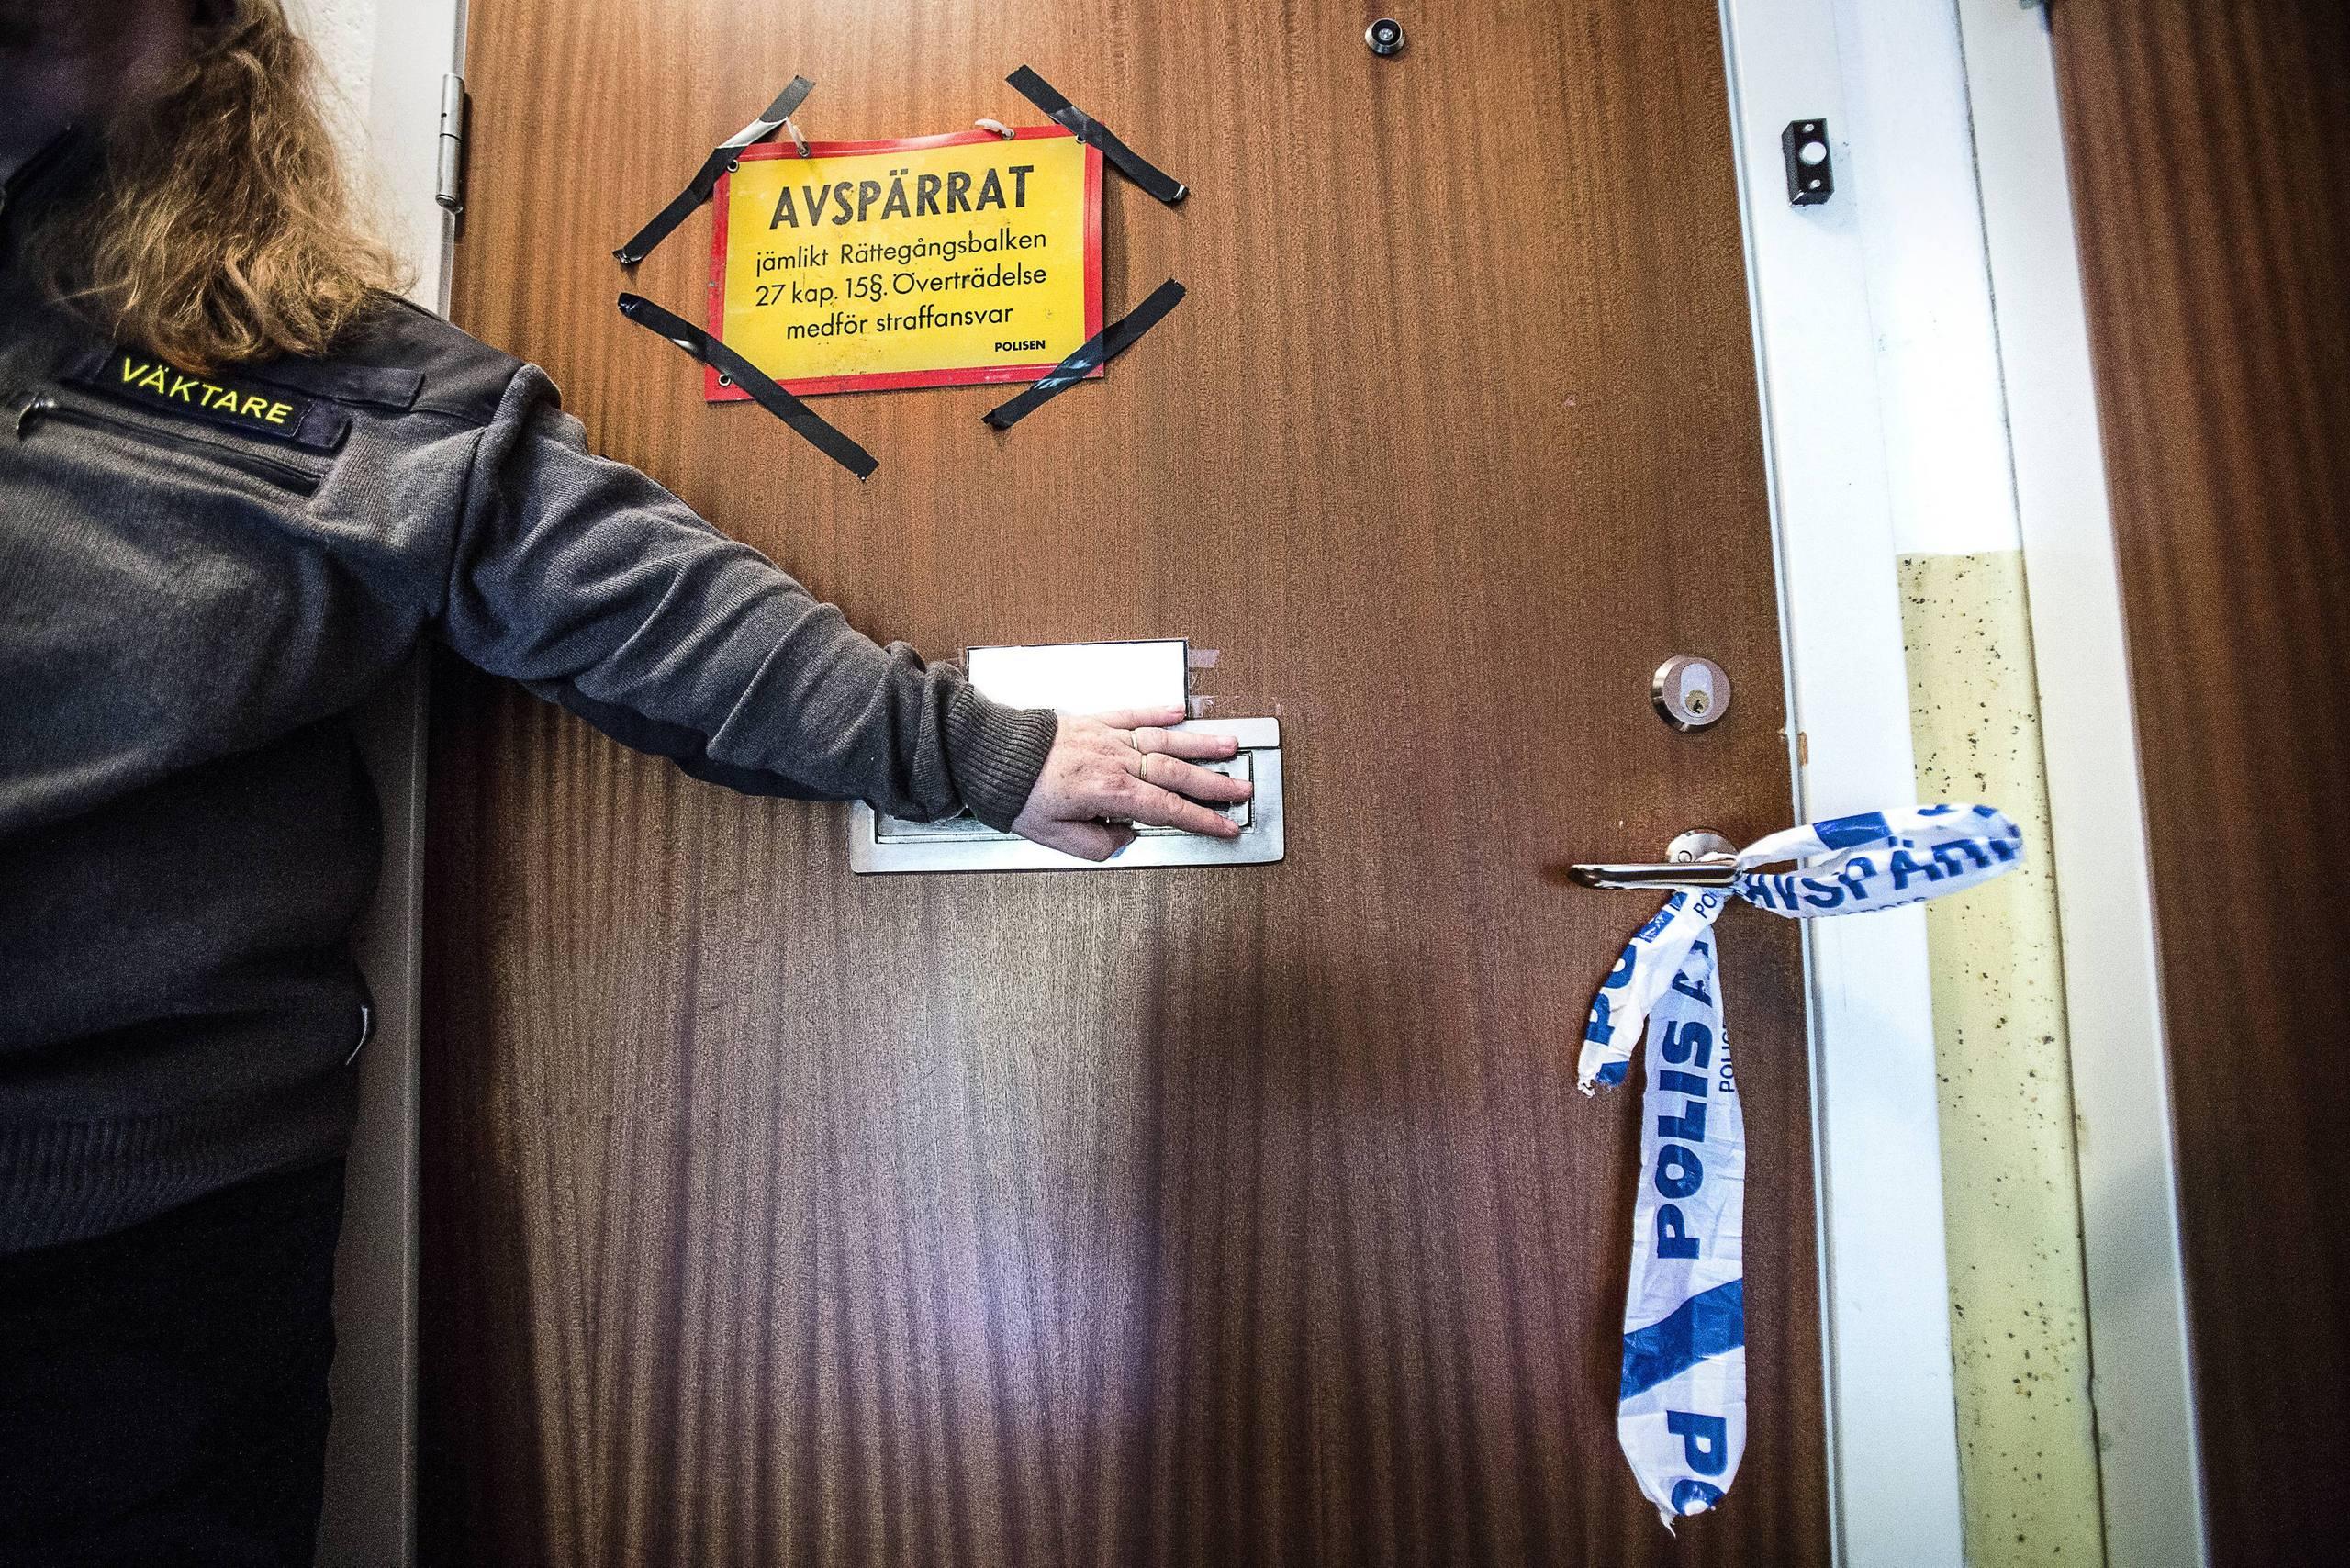 Kvinna anhallen for mordbrand pa froson